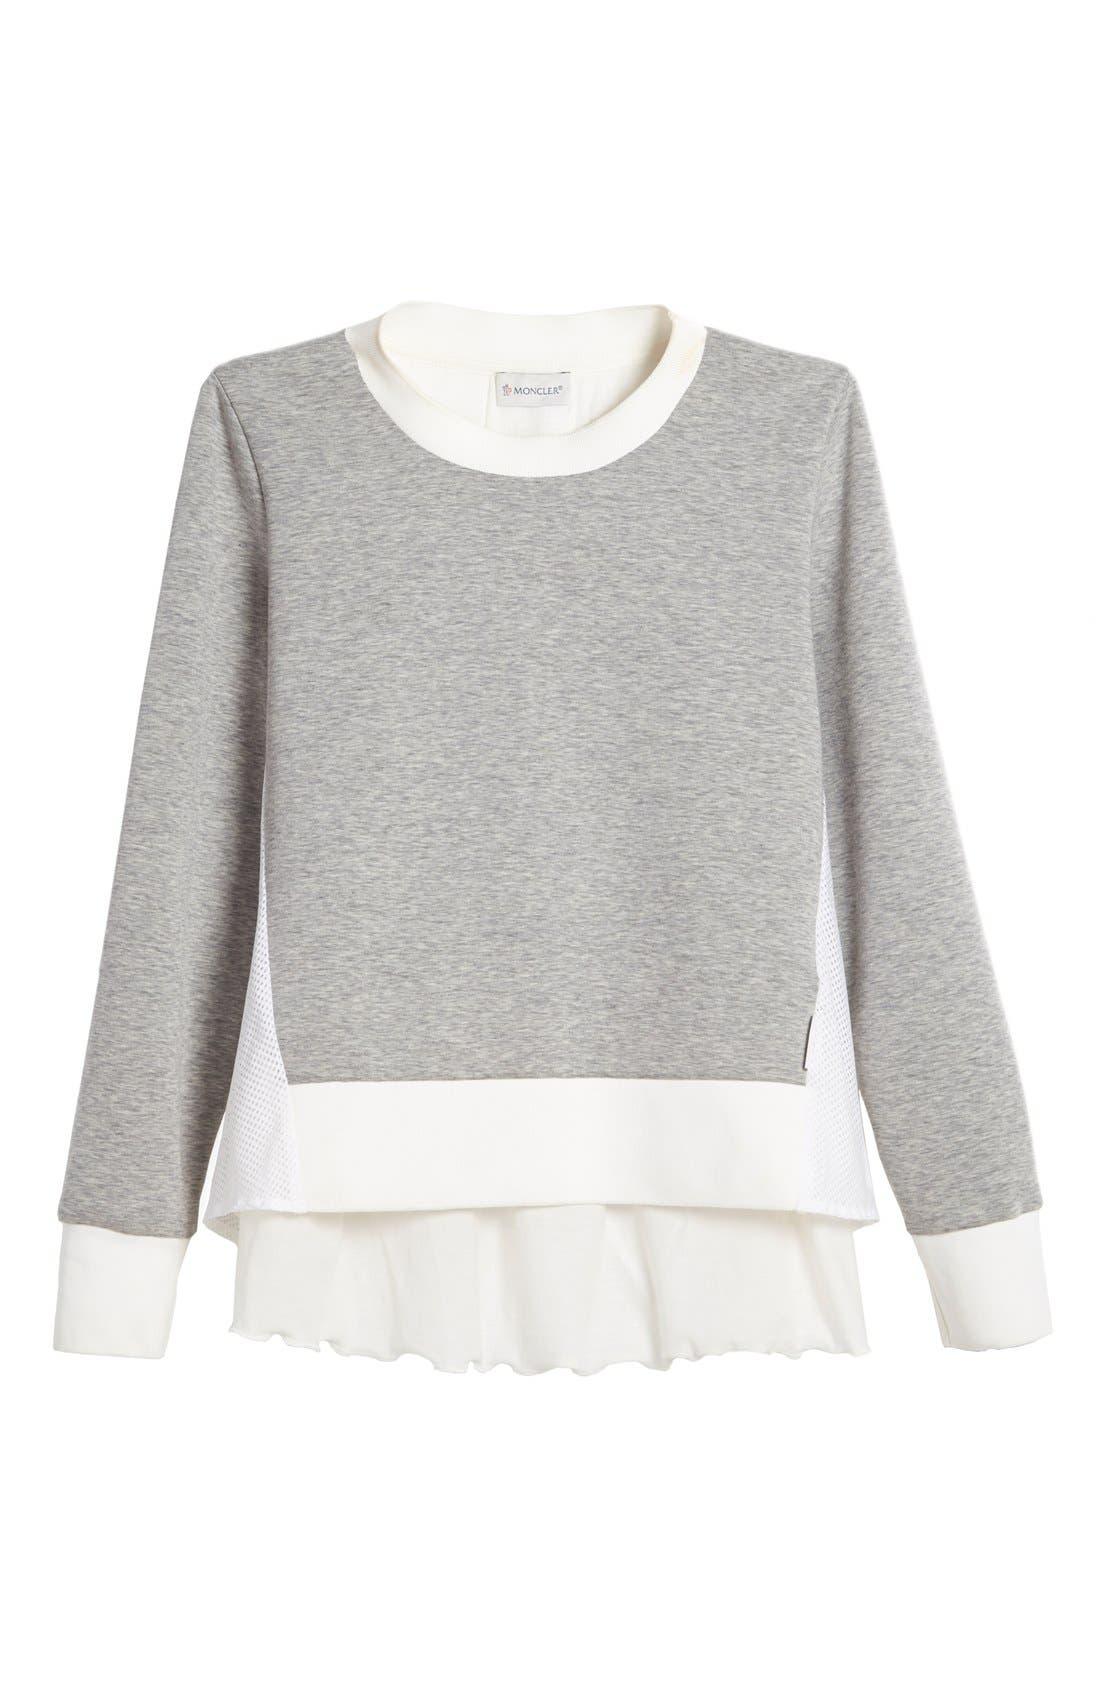 'Maglia Girocollo' Mixed Media Sweatshirt,                             Alternate thumbnail 4, color,                             021